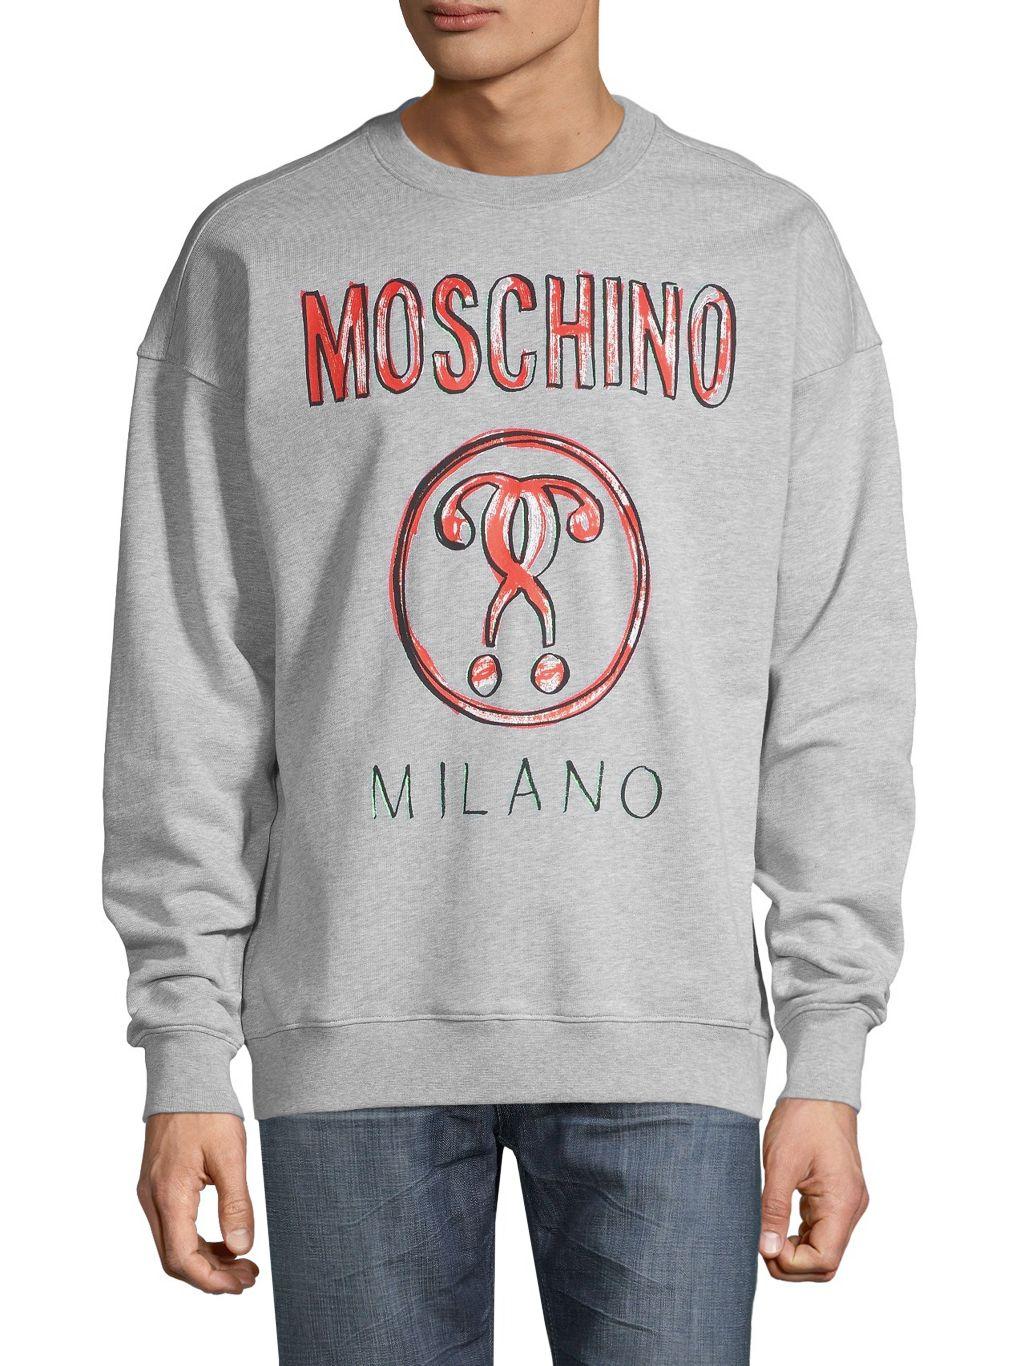 Moschino Couture! Graphic Cotton Sweatshirt